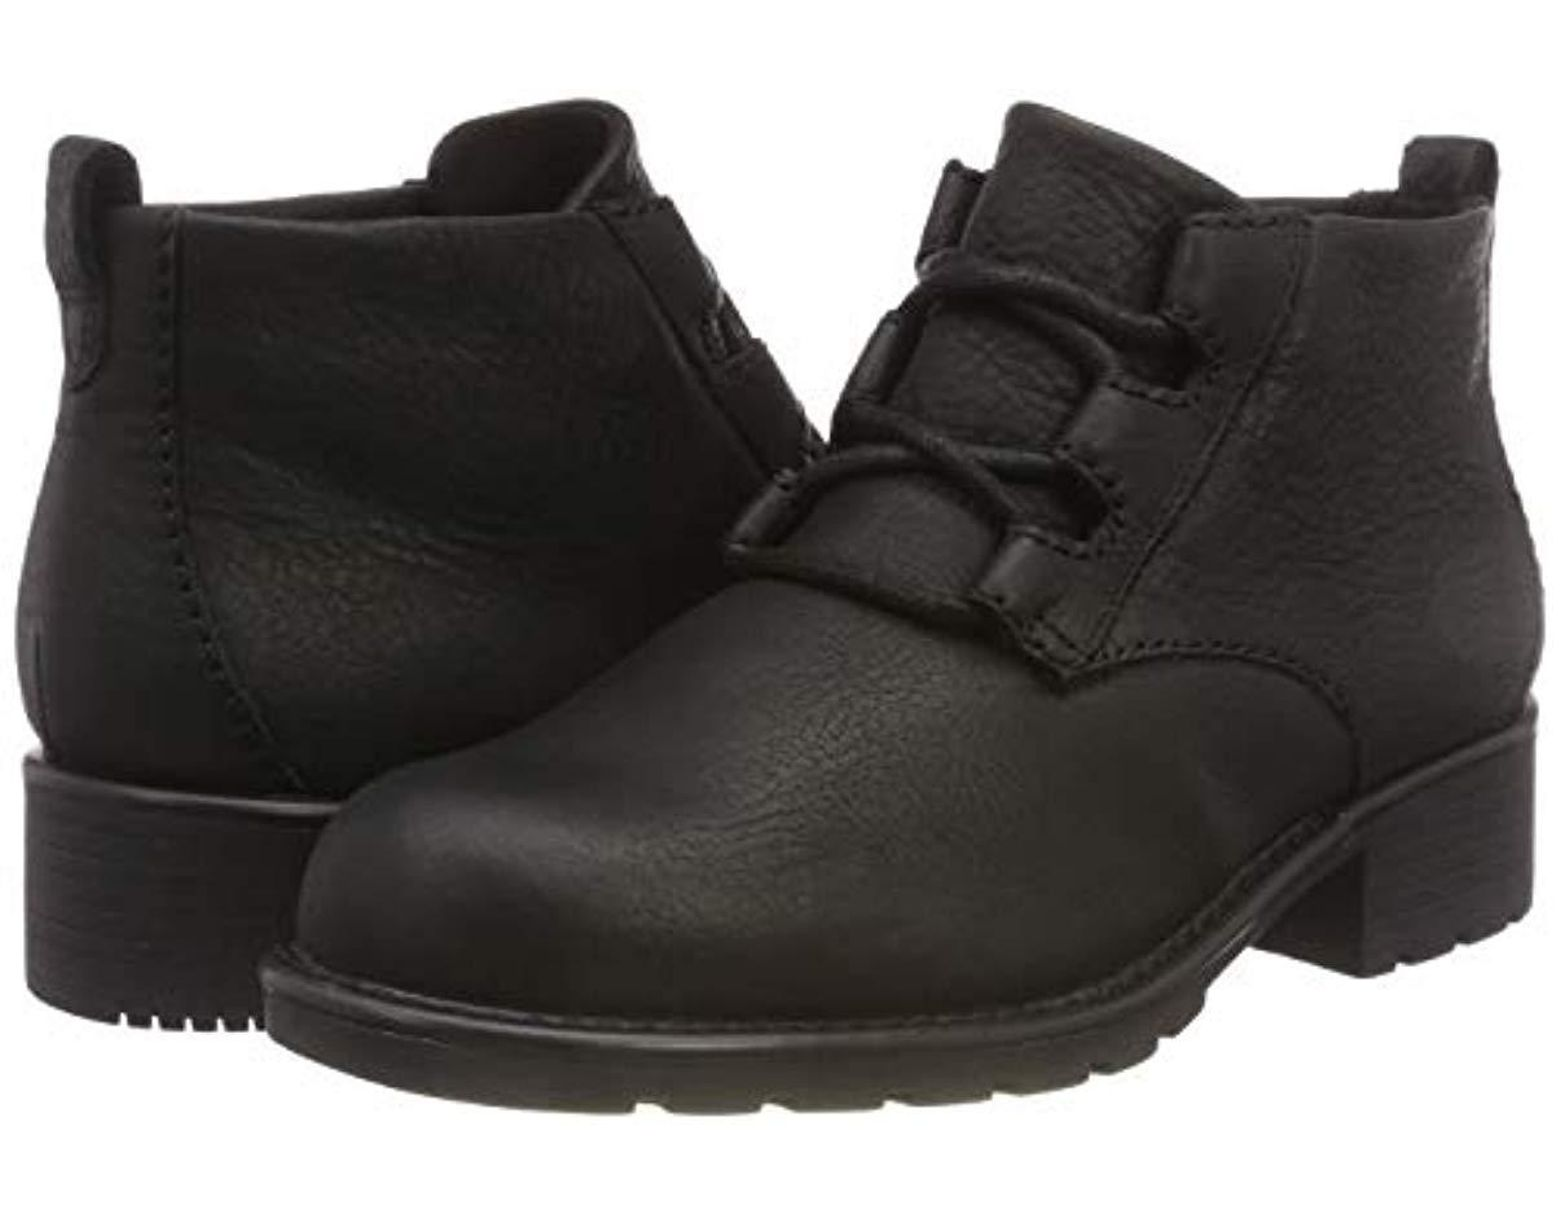 Ladies Clarks Block Heeled Ankle Boots 'Orinoco Oaks'